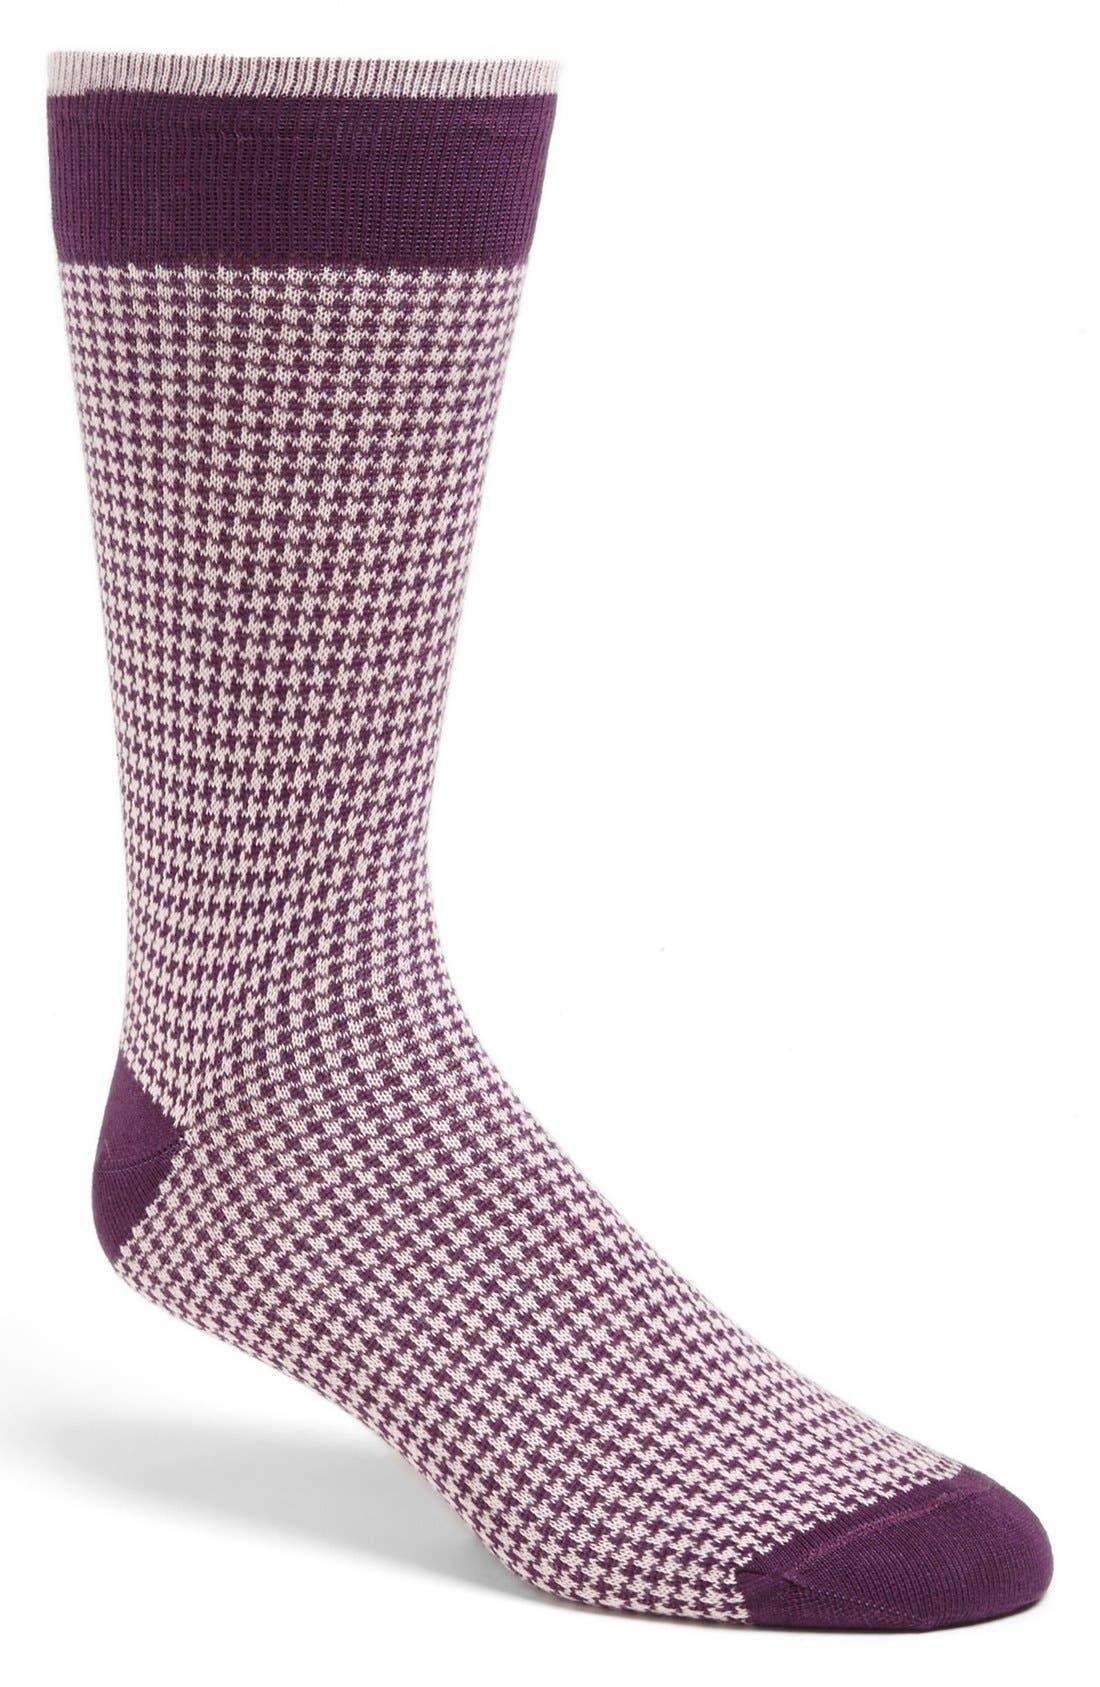 Main Image - Lorenzo Uomo Houndstooth Socks